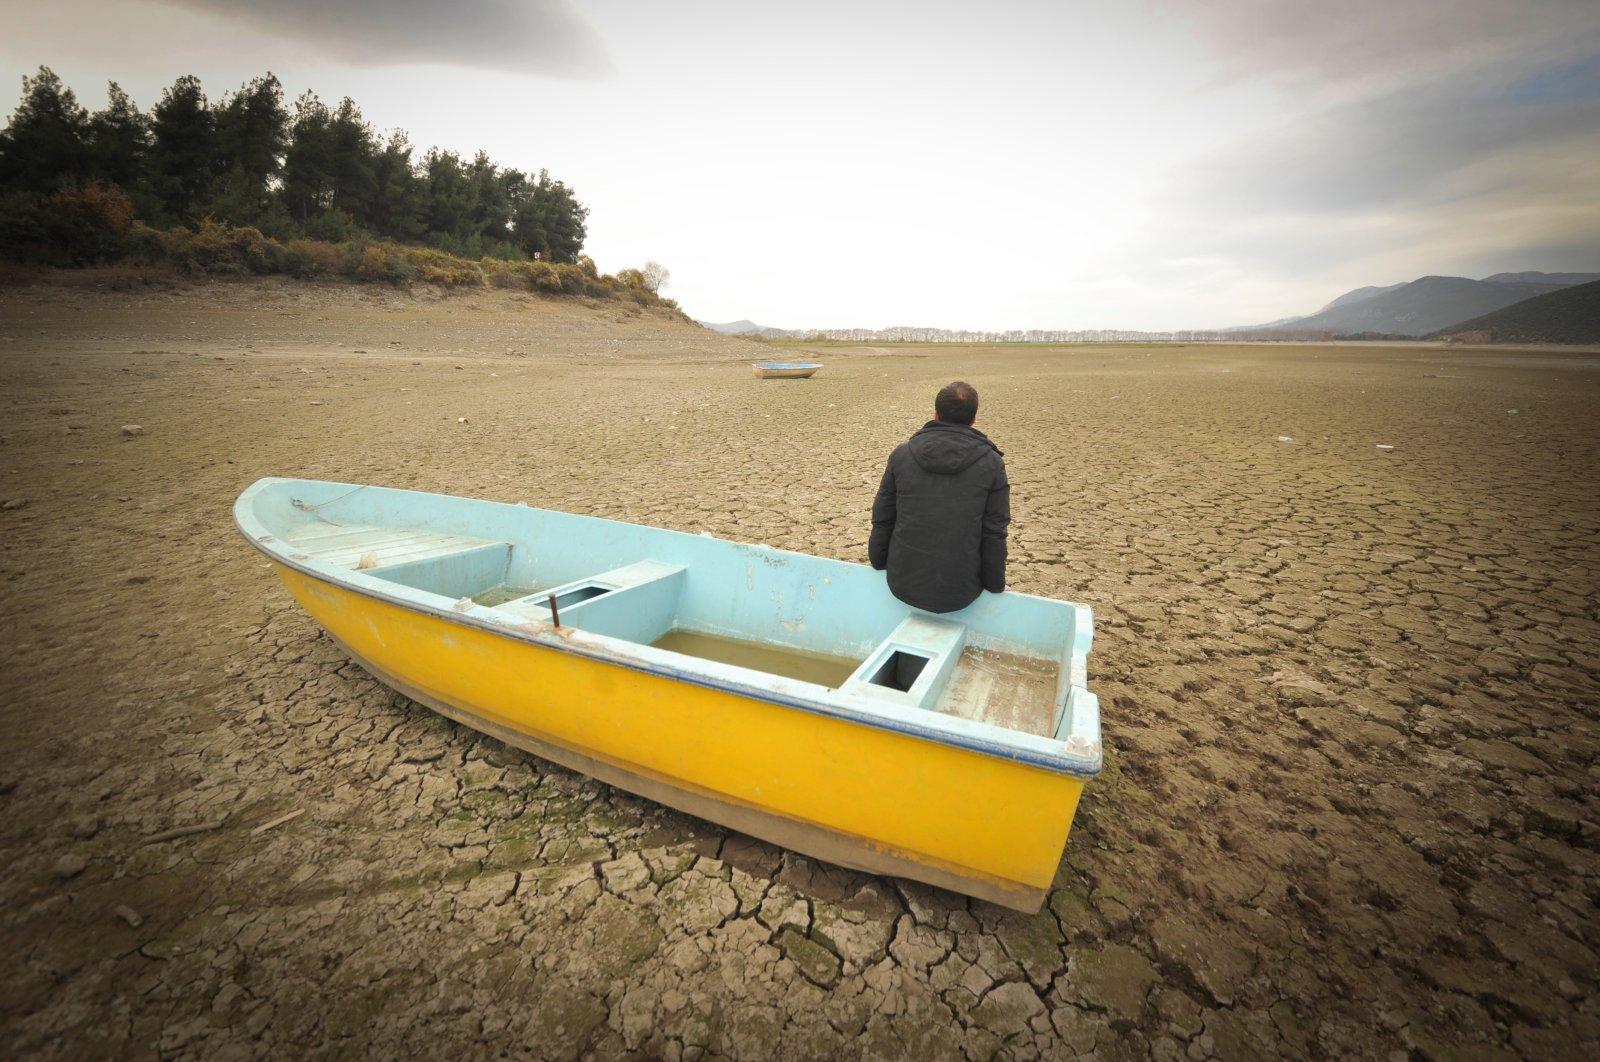 A man sits on a small boat on a dried part of Gölbaşı Dam in the Kestel district, in Bursa, northwestern Turkey, Dec. 11, 2020. (DHA PHOTO)